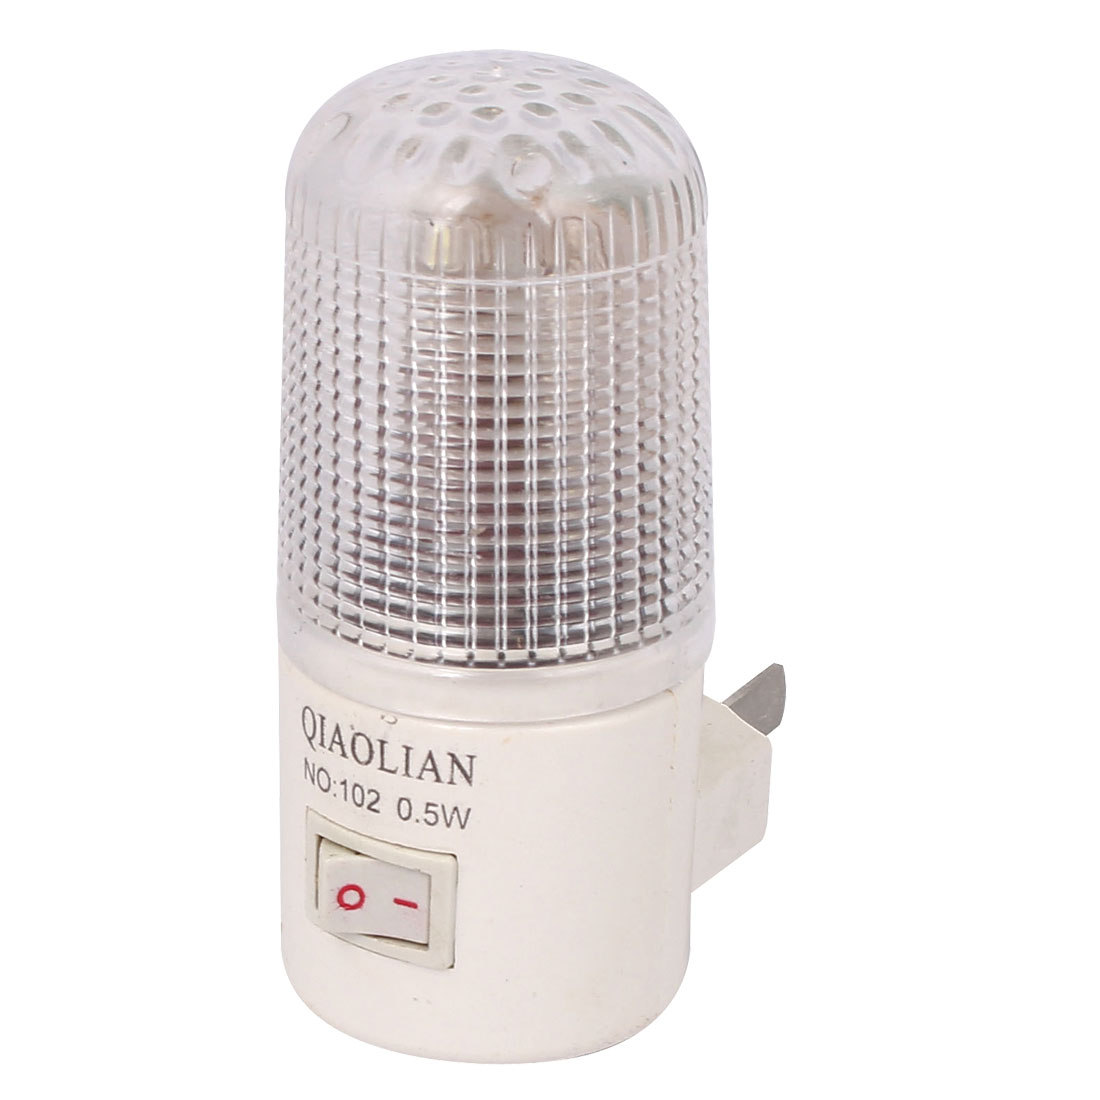 0.5W Bedroom Wall Mounting Night Lamp Light Bulb US AU Plug 110V-250V